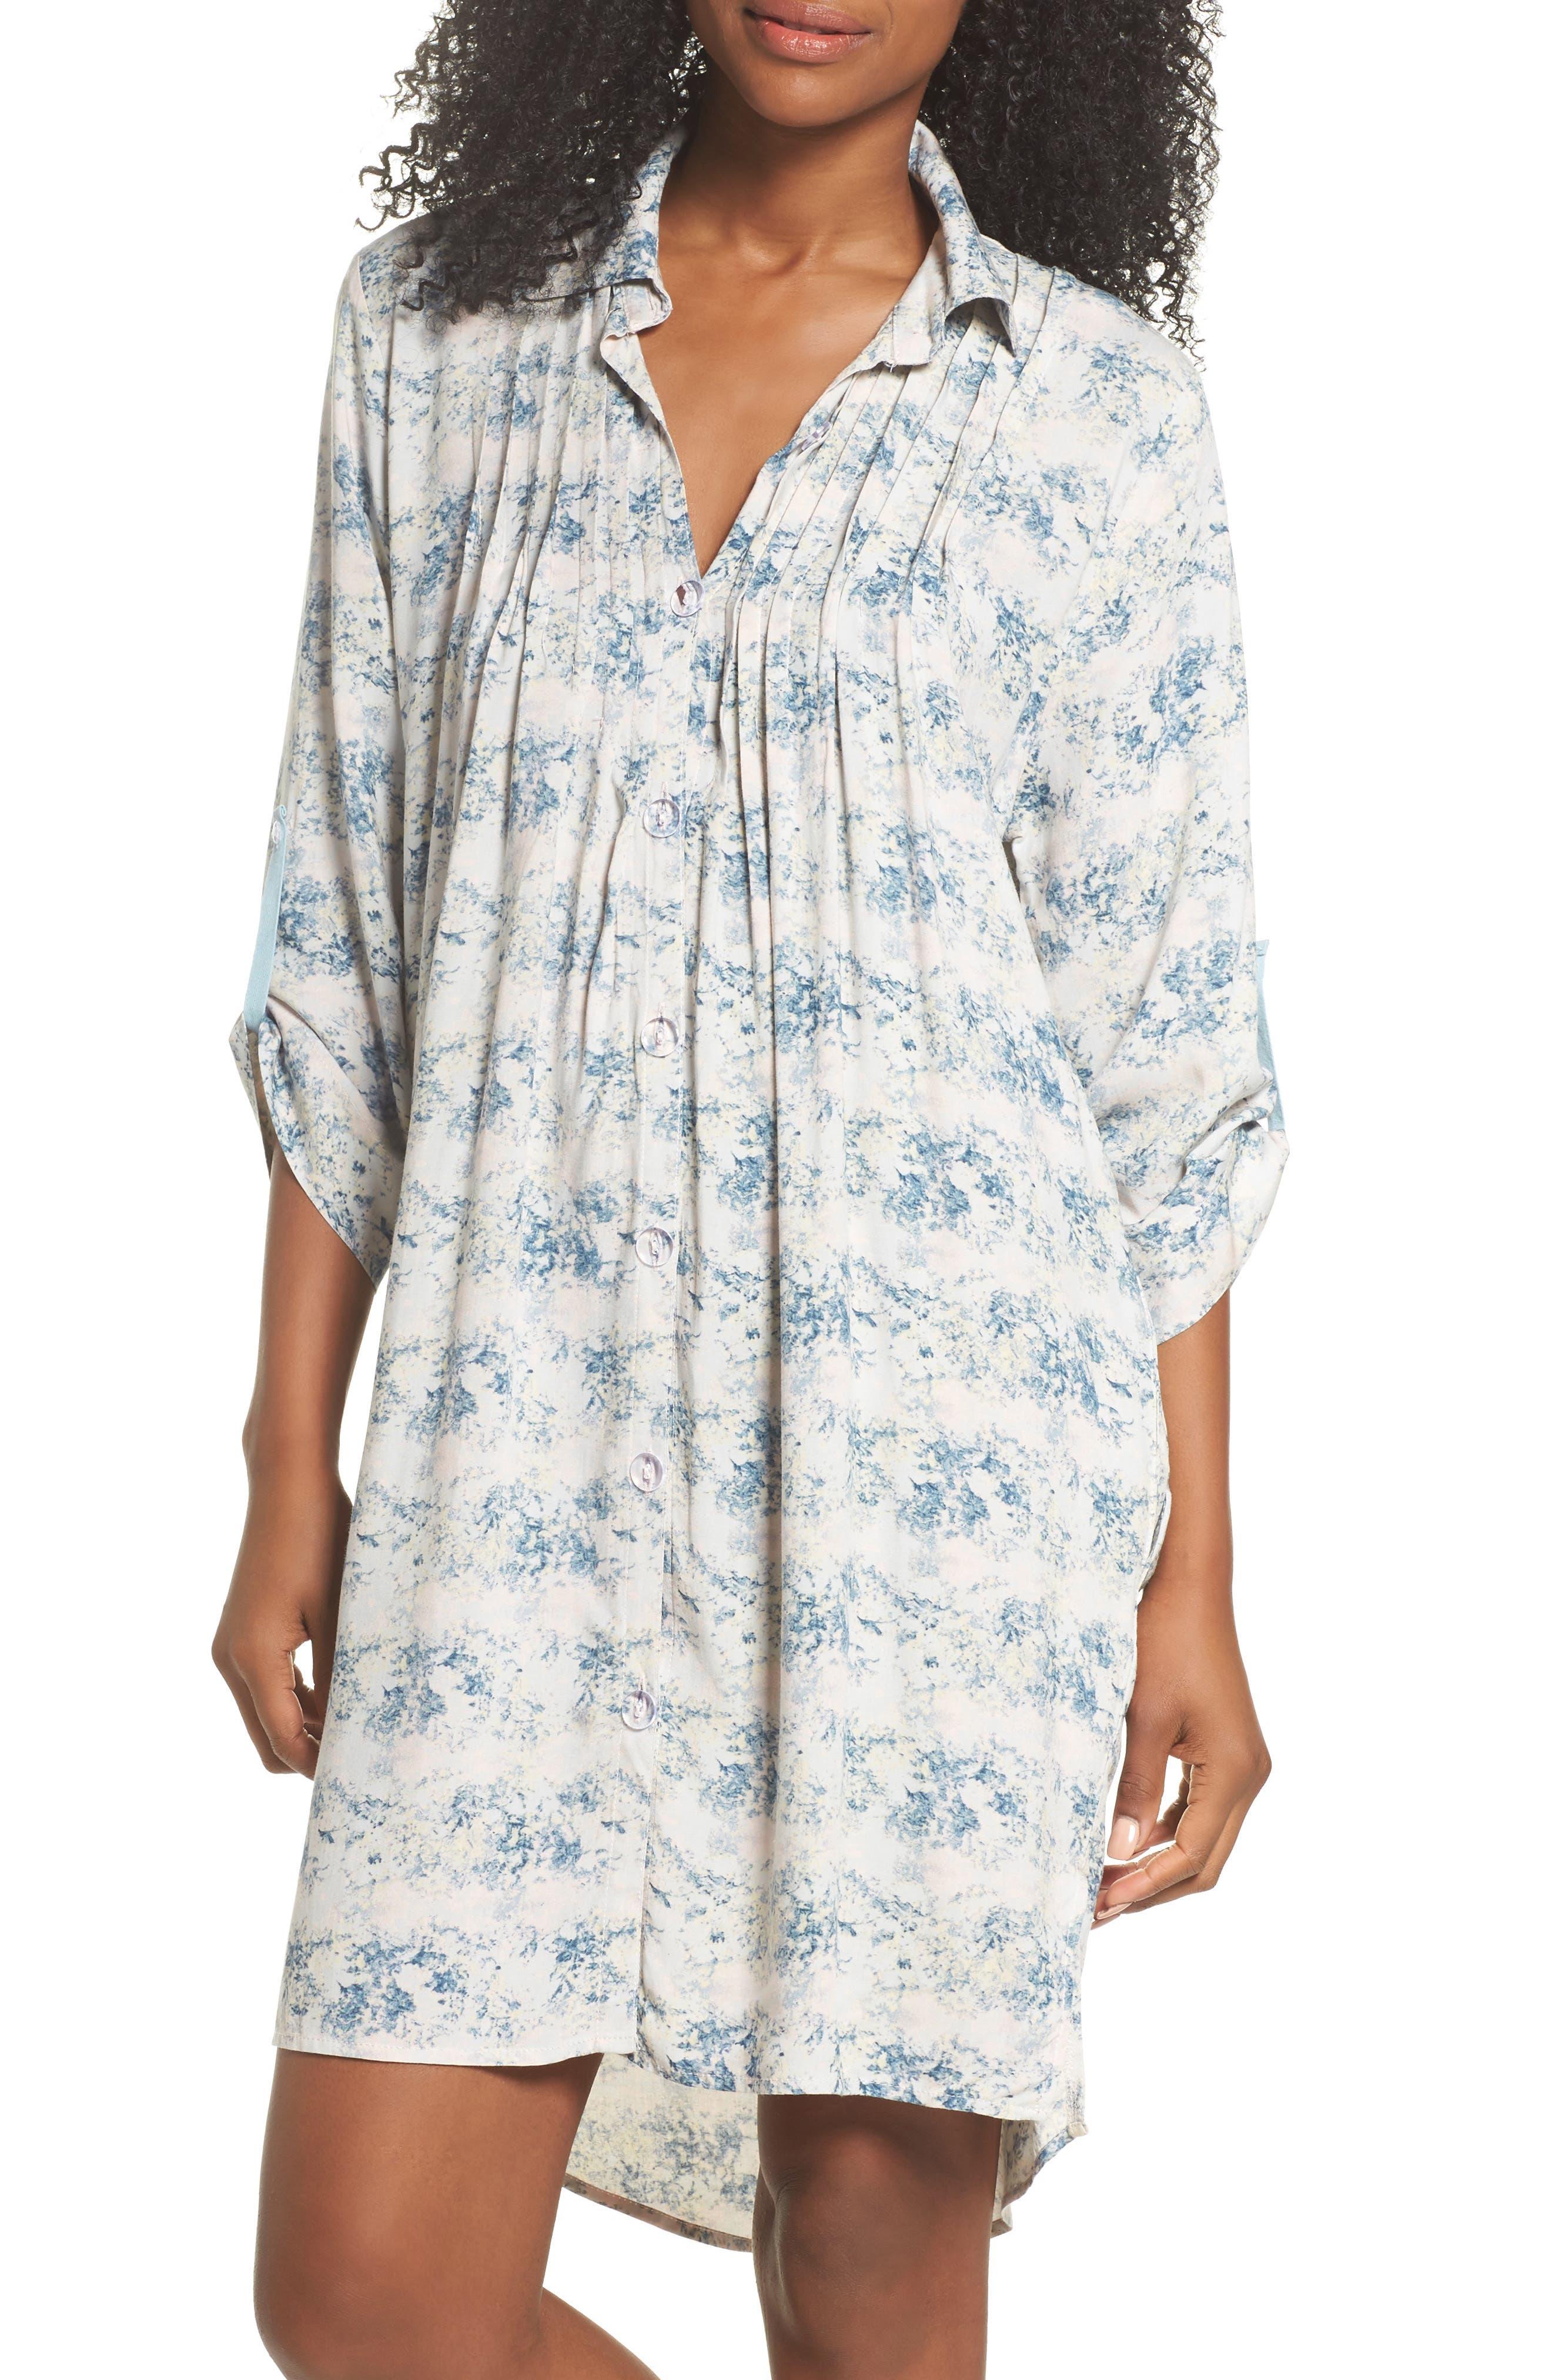 PAPINELLE Floral Print Sleep Shirt, Main, color, 403